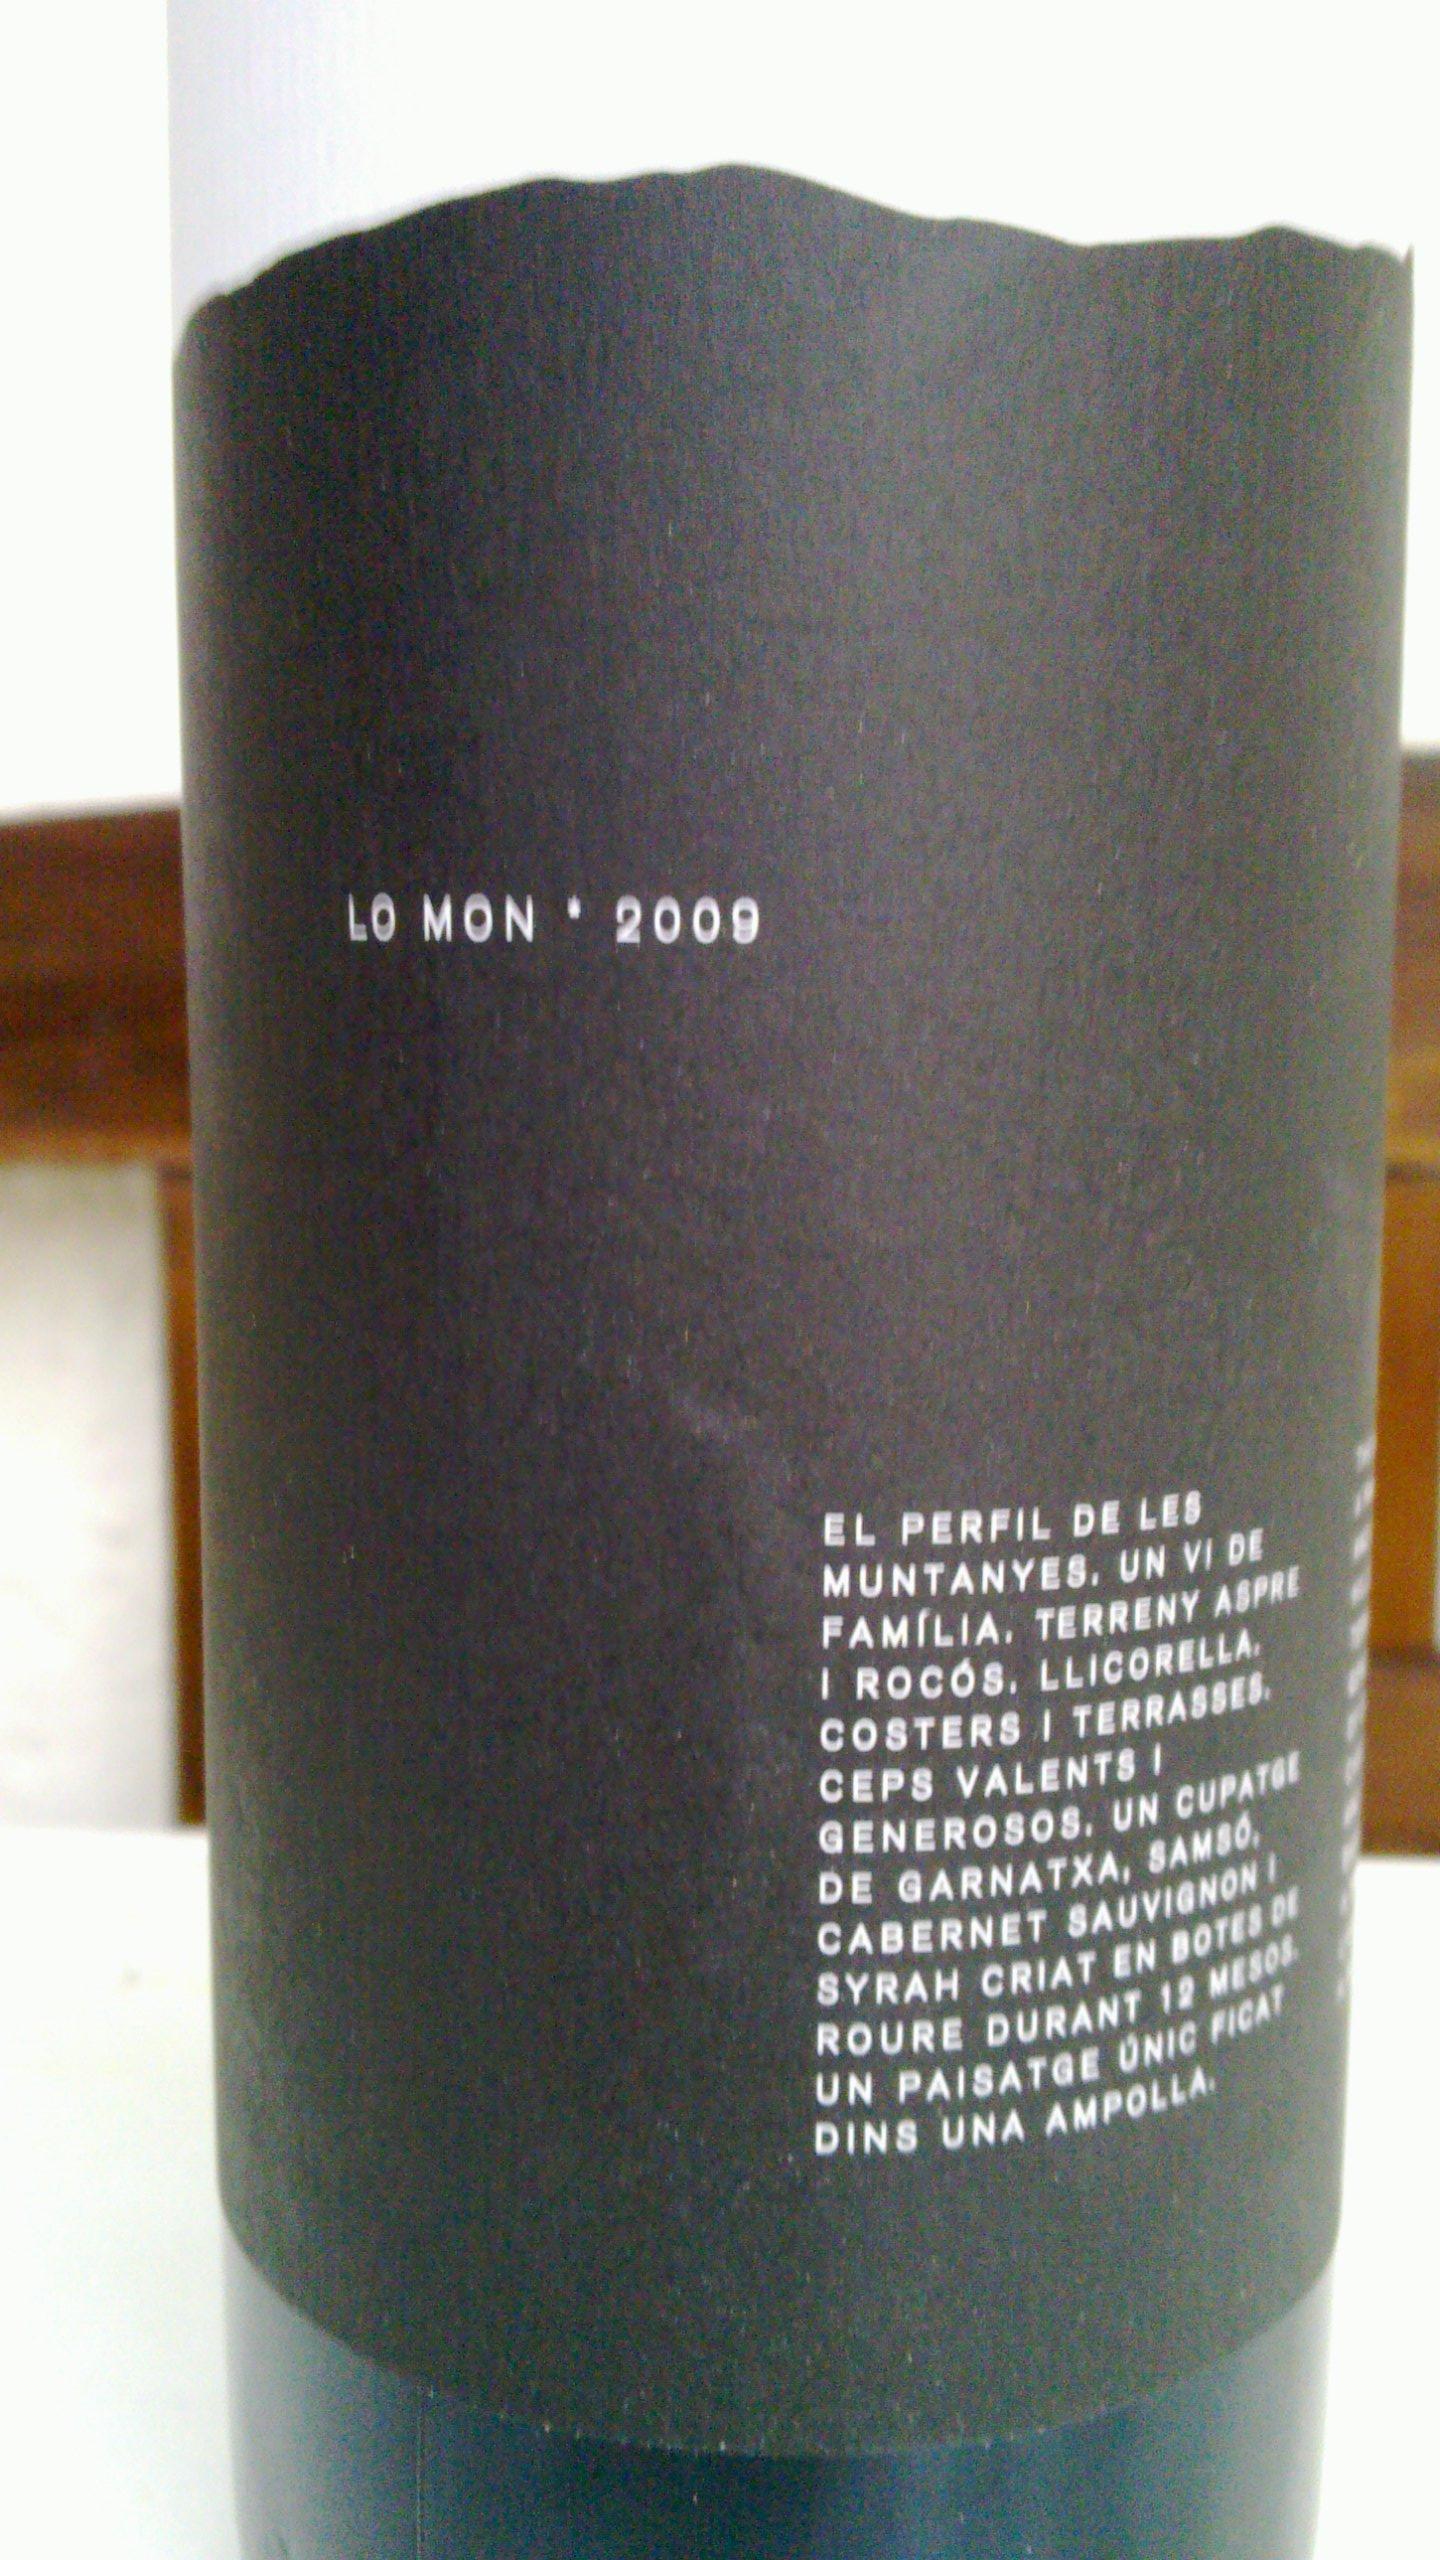 Lo Mon 2009 2